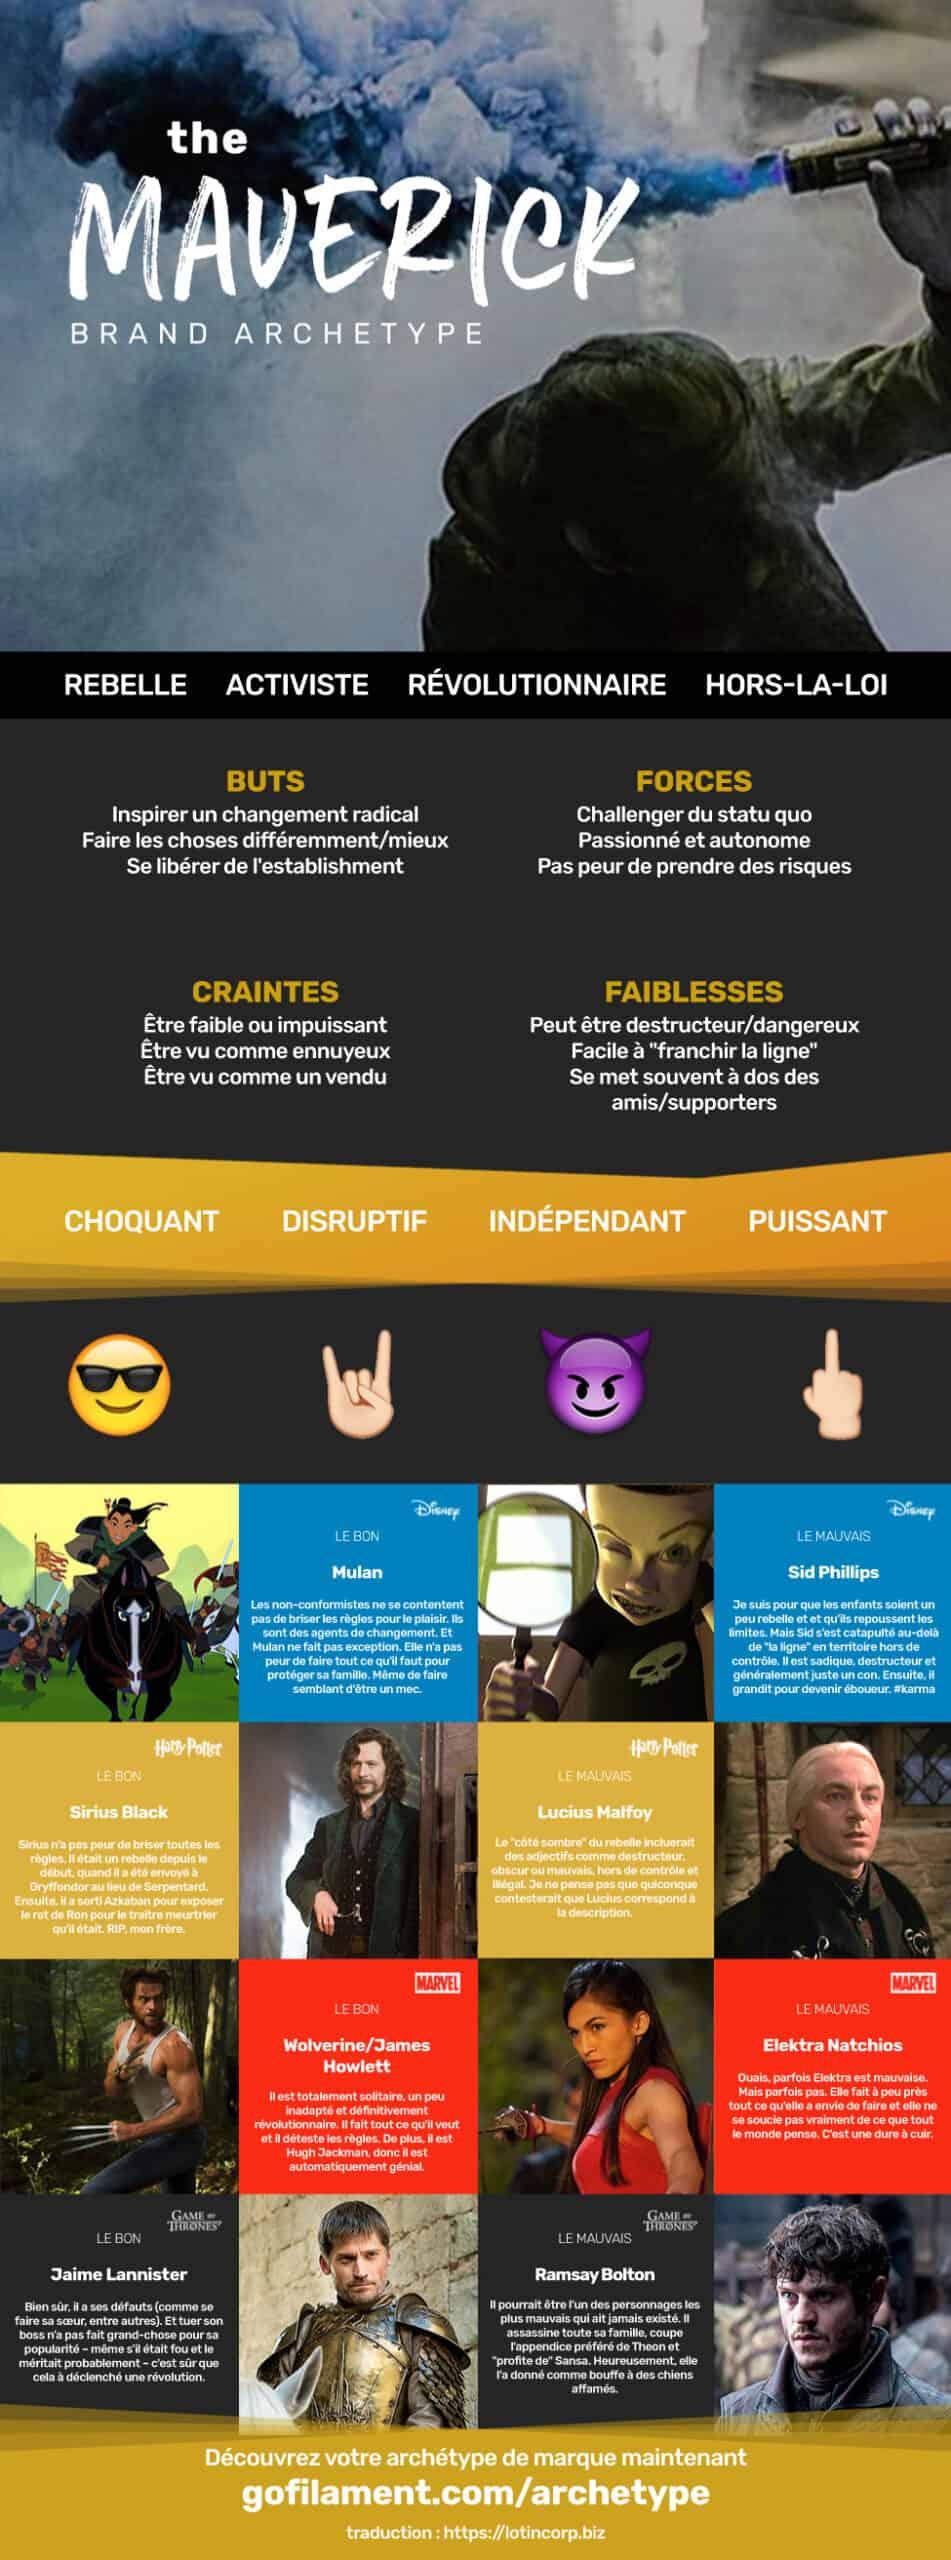 infographie : archétype de marque rebelle